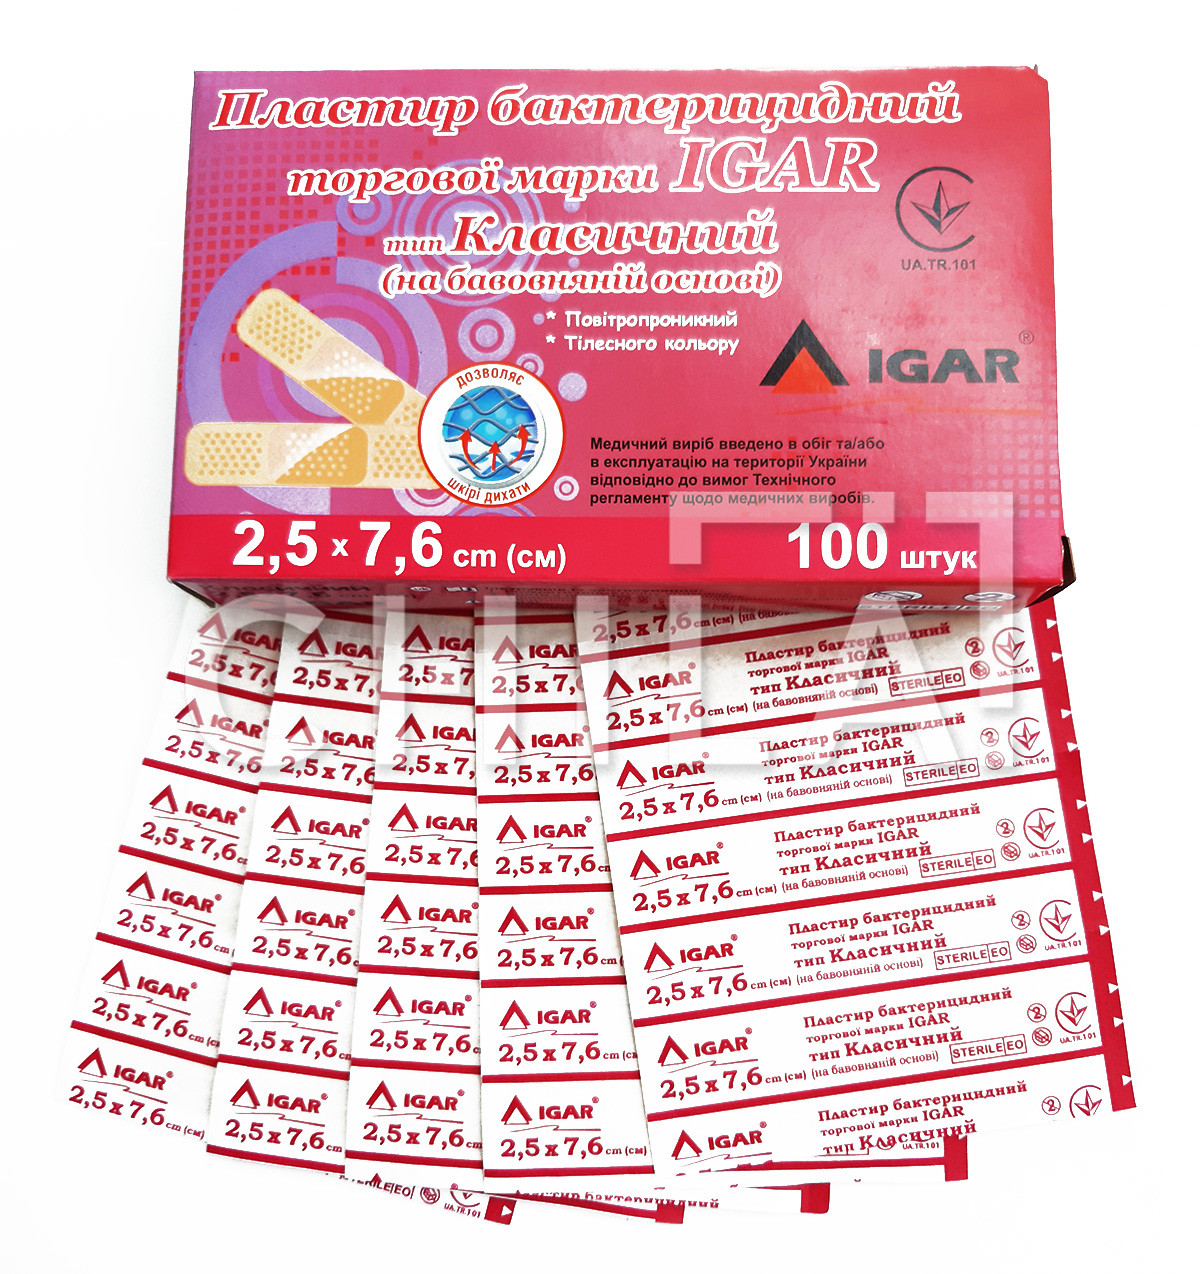 Пластырь бактерицидный IGAR Классический 2,5 х 7,6 см (100 шт/уп)